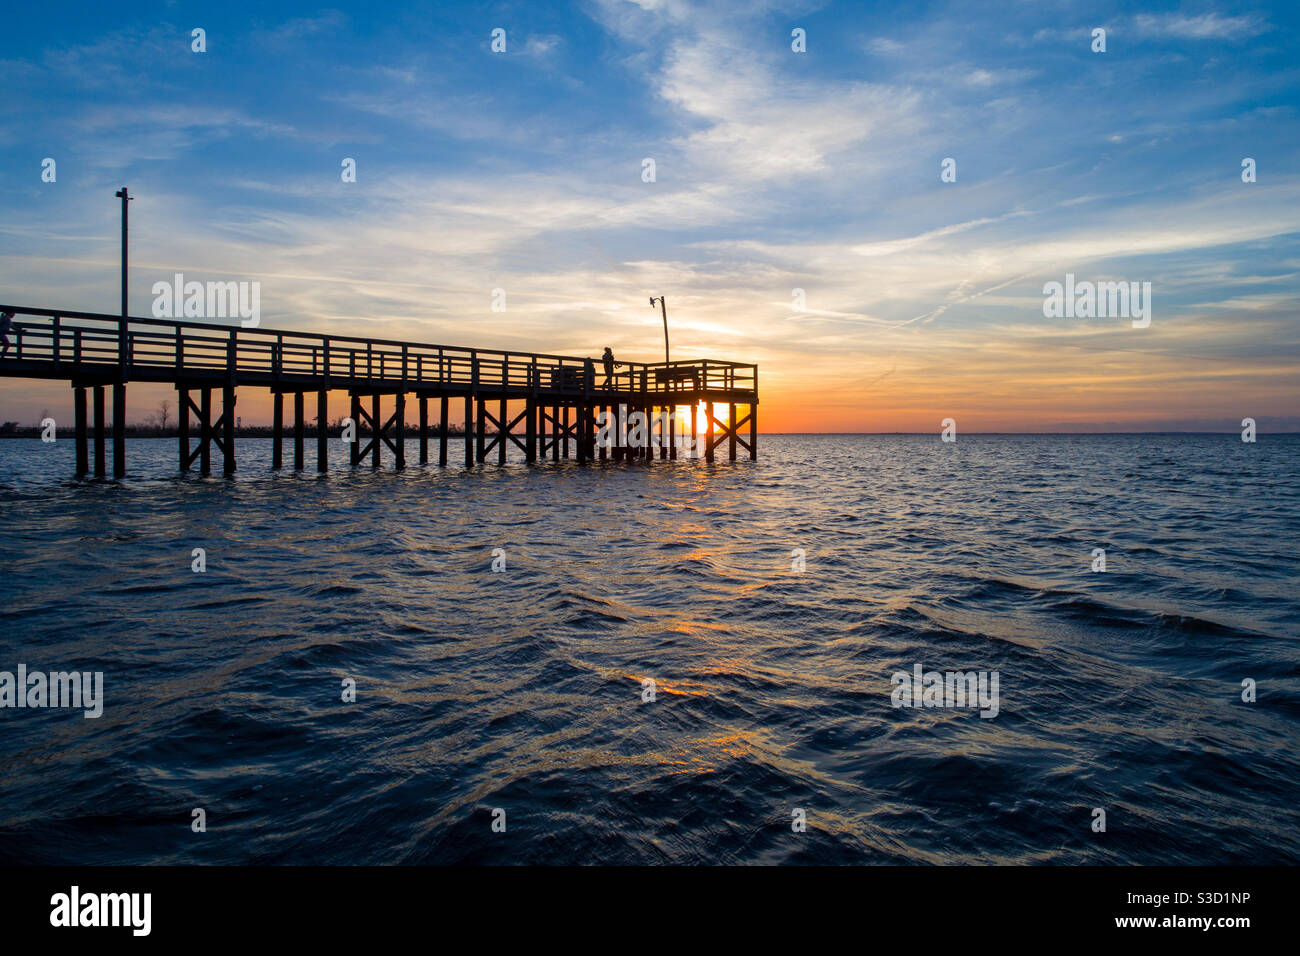 Pier bei Sonnenuntergang im Januar 2021 Stockfoto